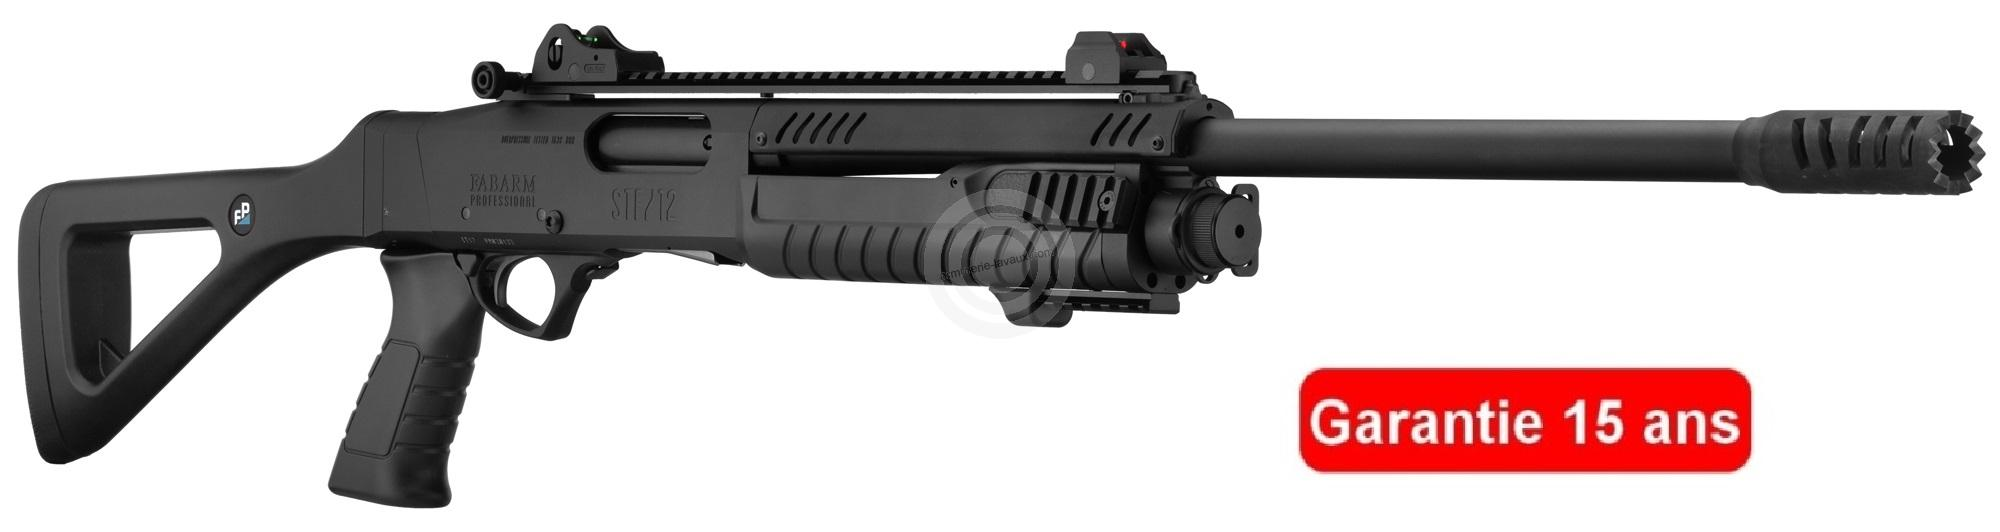 Fusil à pompe FABARM STF12 Tactical Professionnal cal.12/76